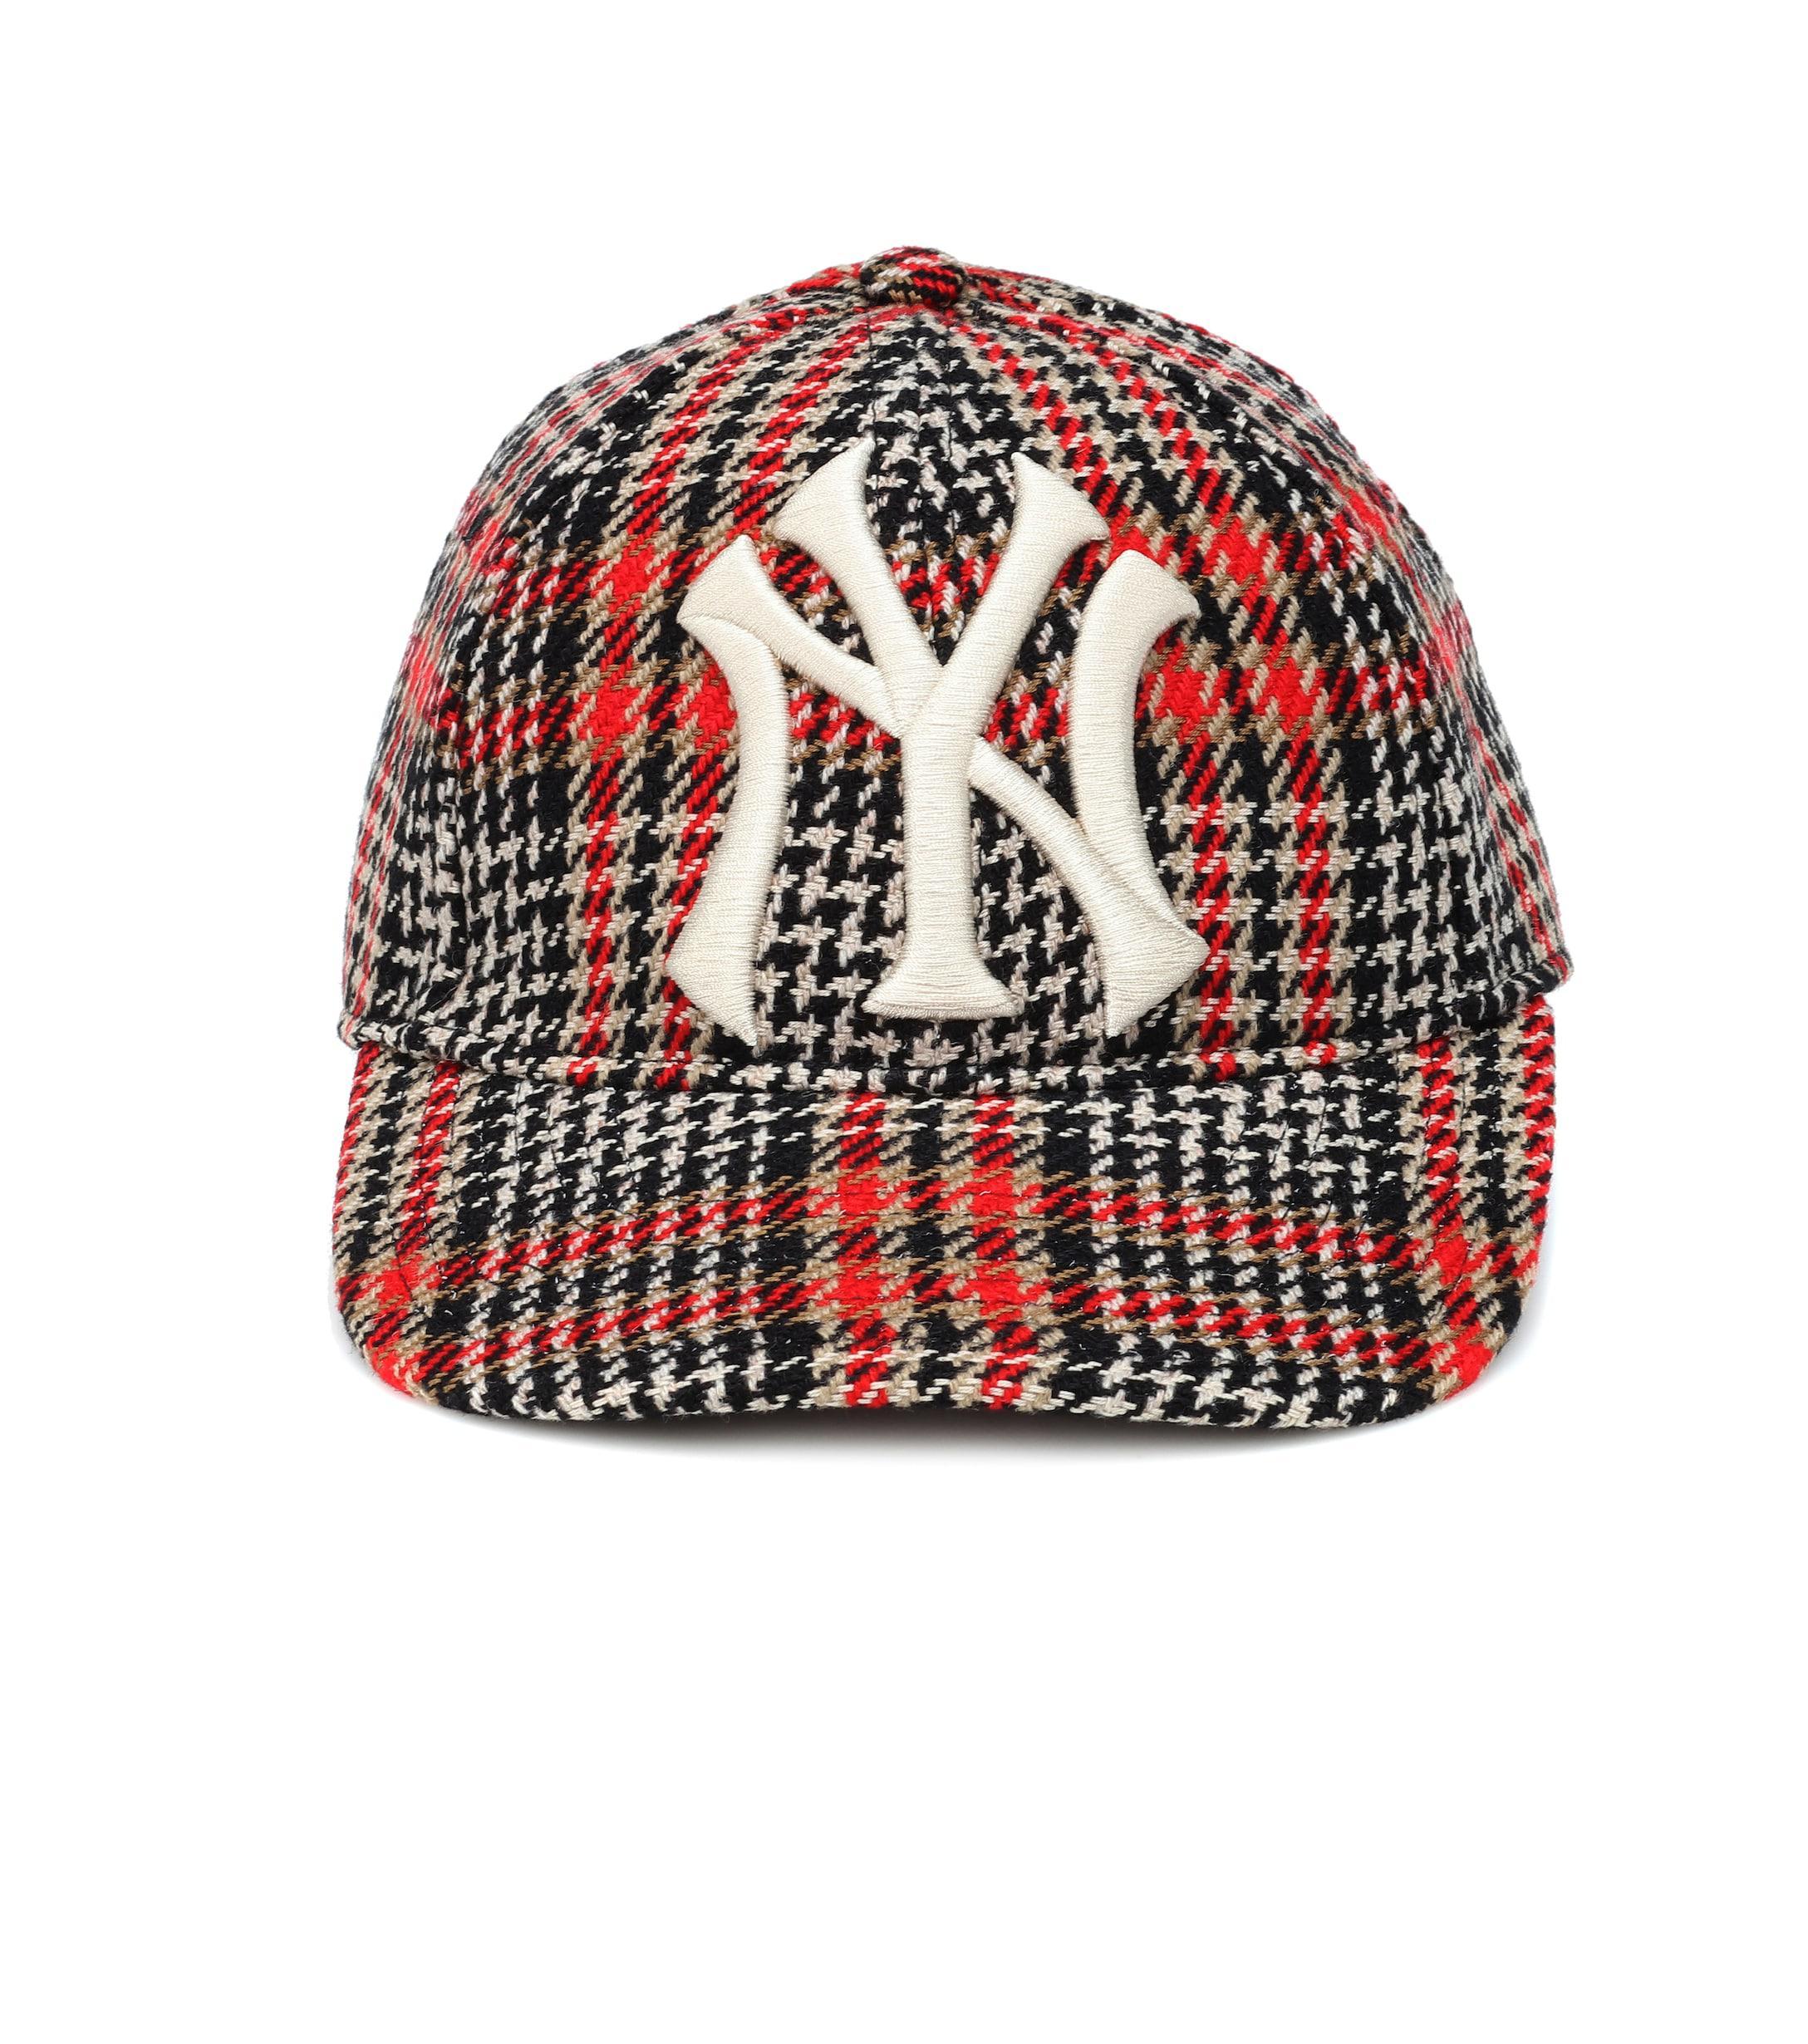 6eff42badc347 Gucci - Multicolor Ny Yankees Houndstooth Baseball Cap - Lyst. View  fullscreen